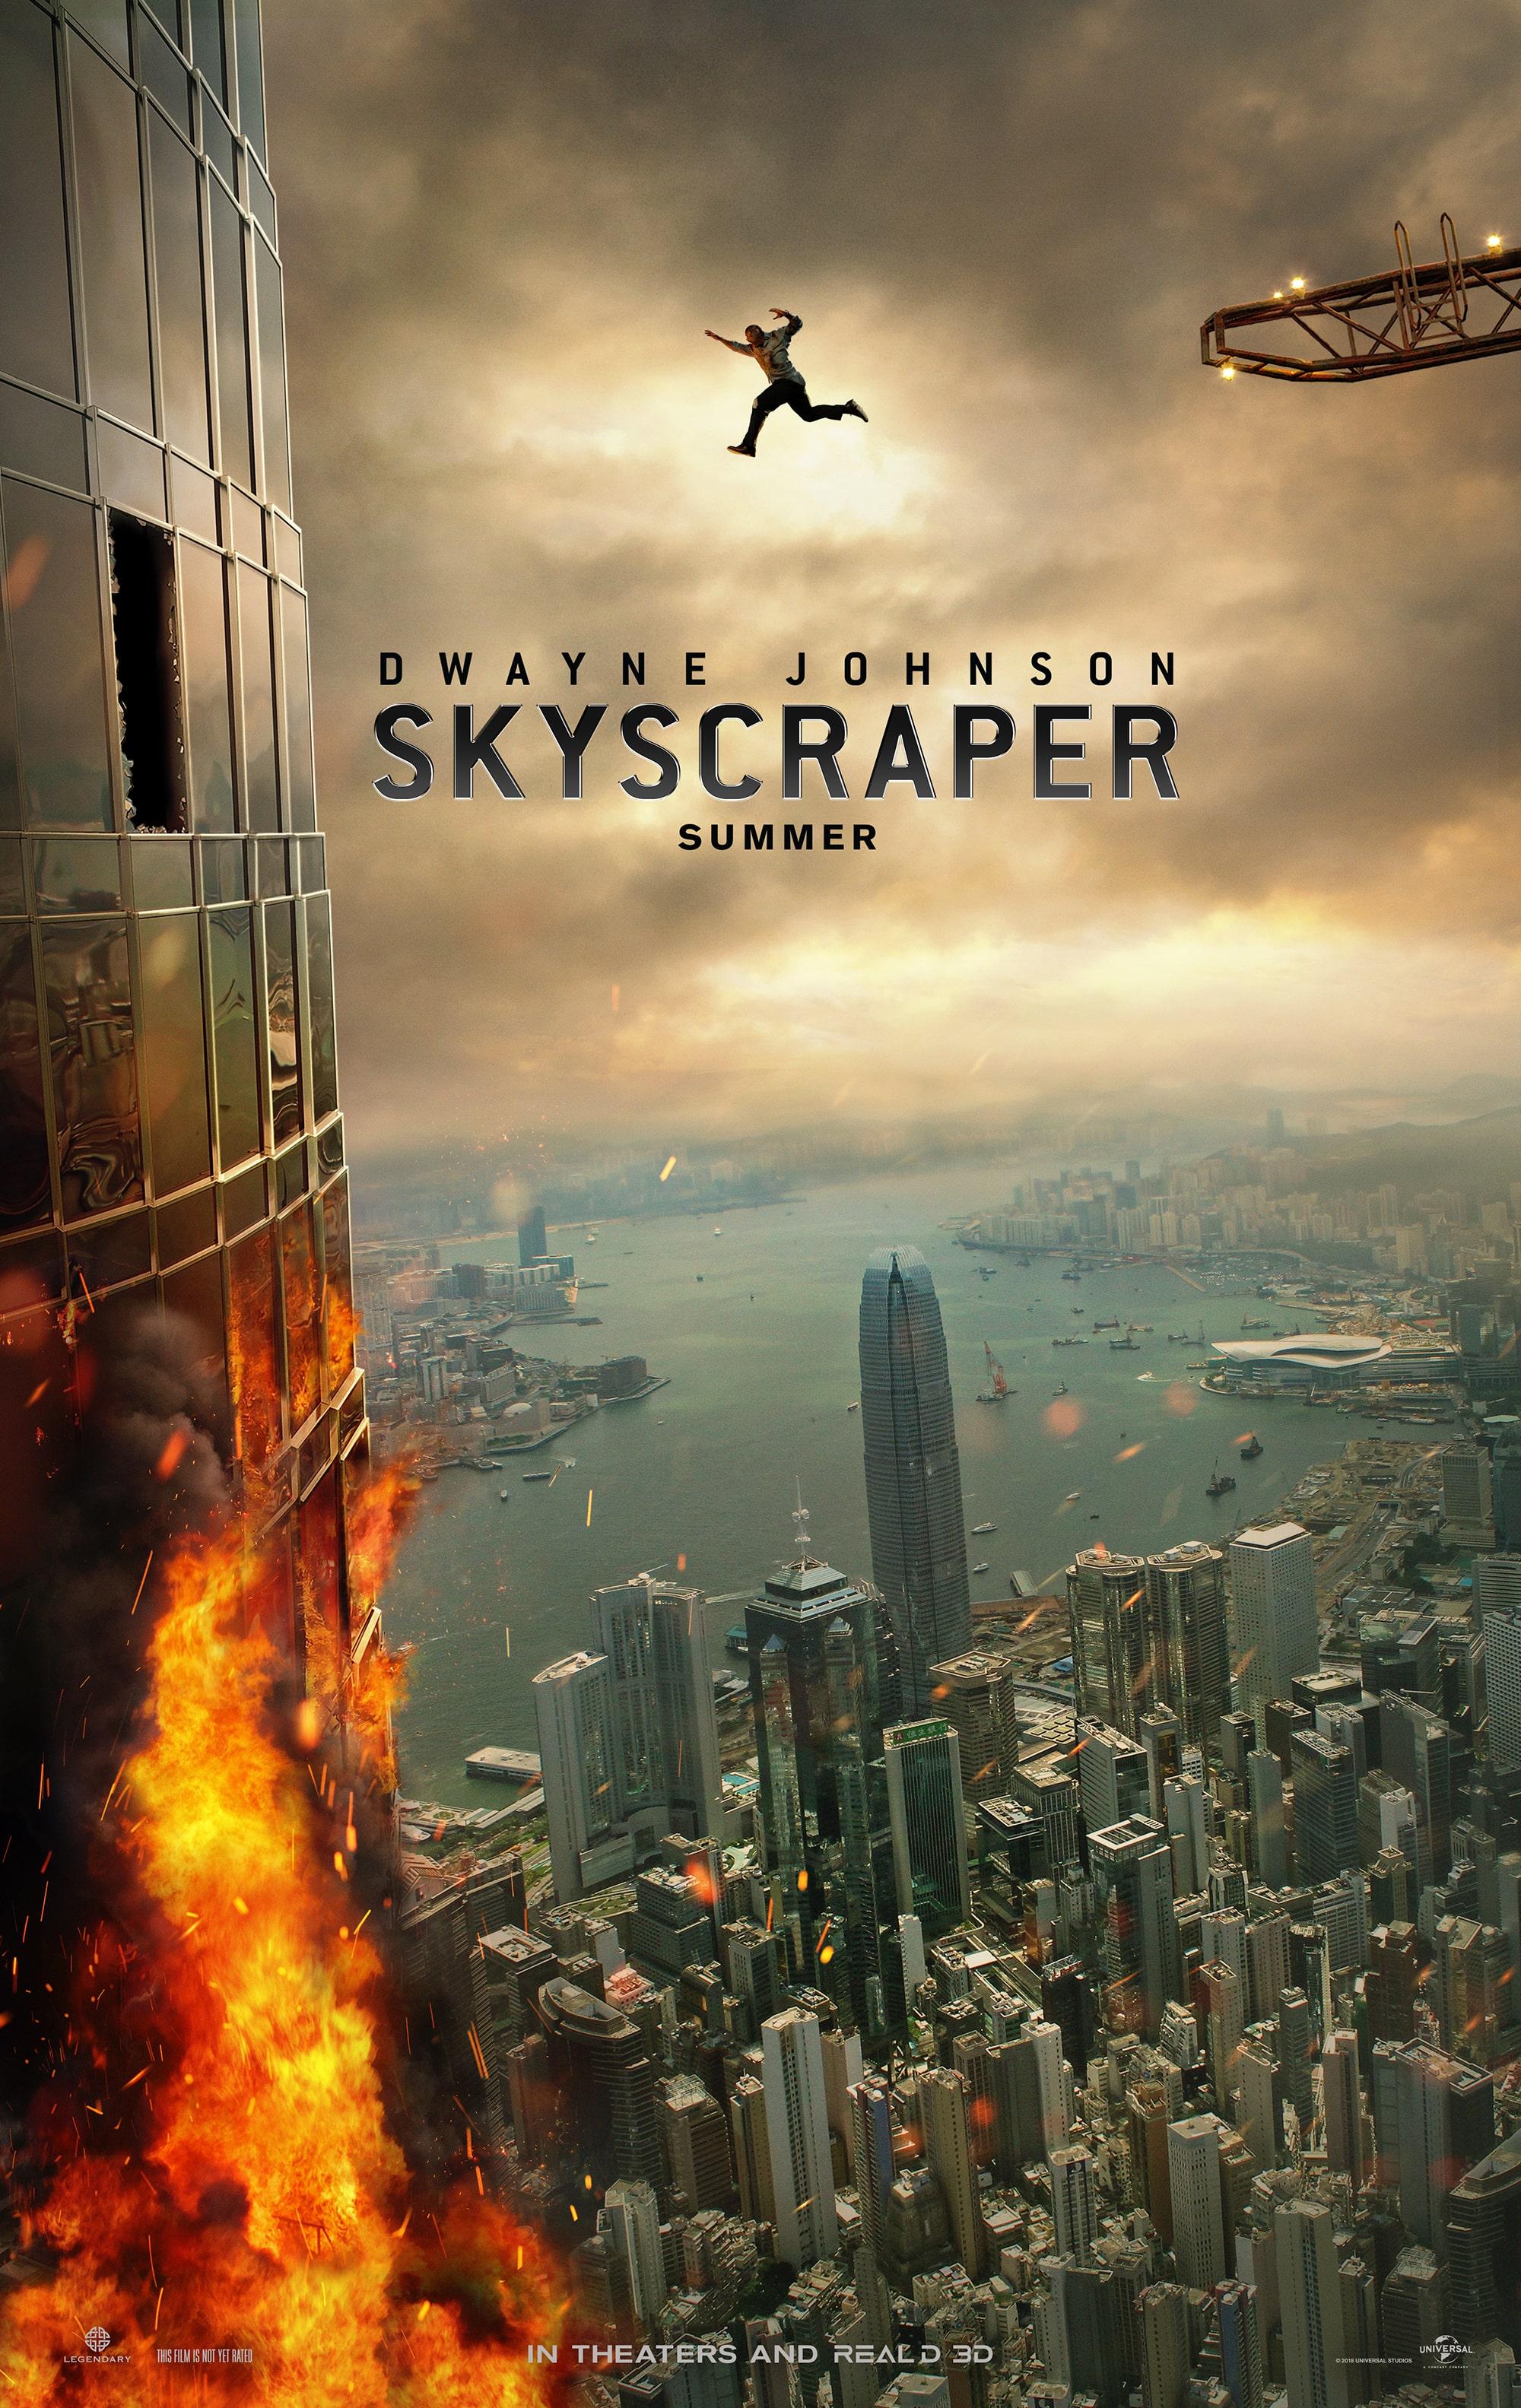 skyscraper-3d-movie.JPG